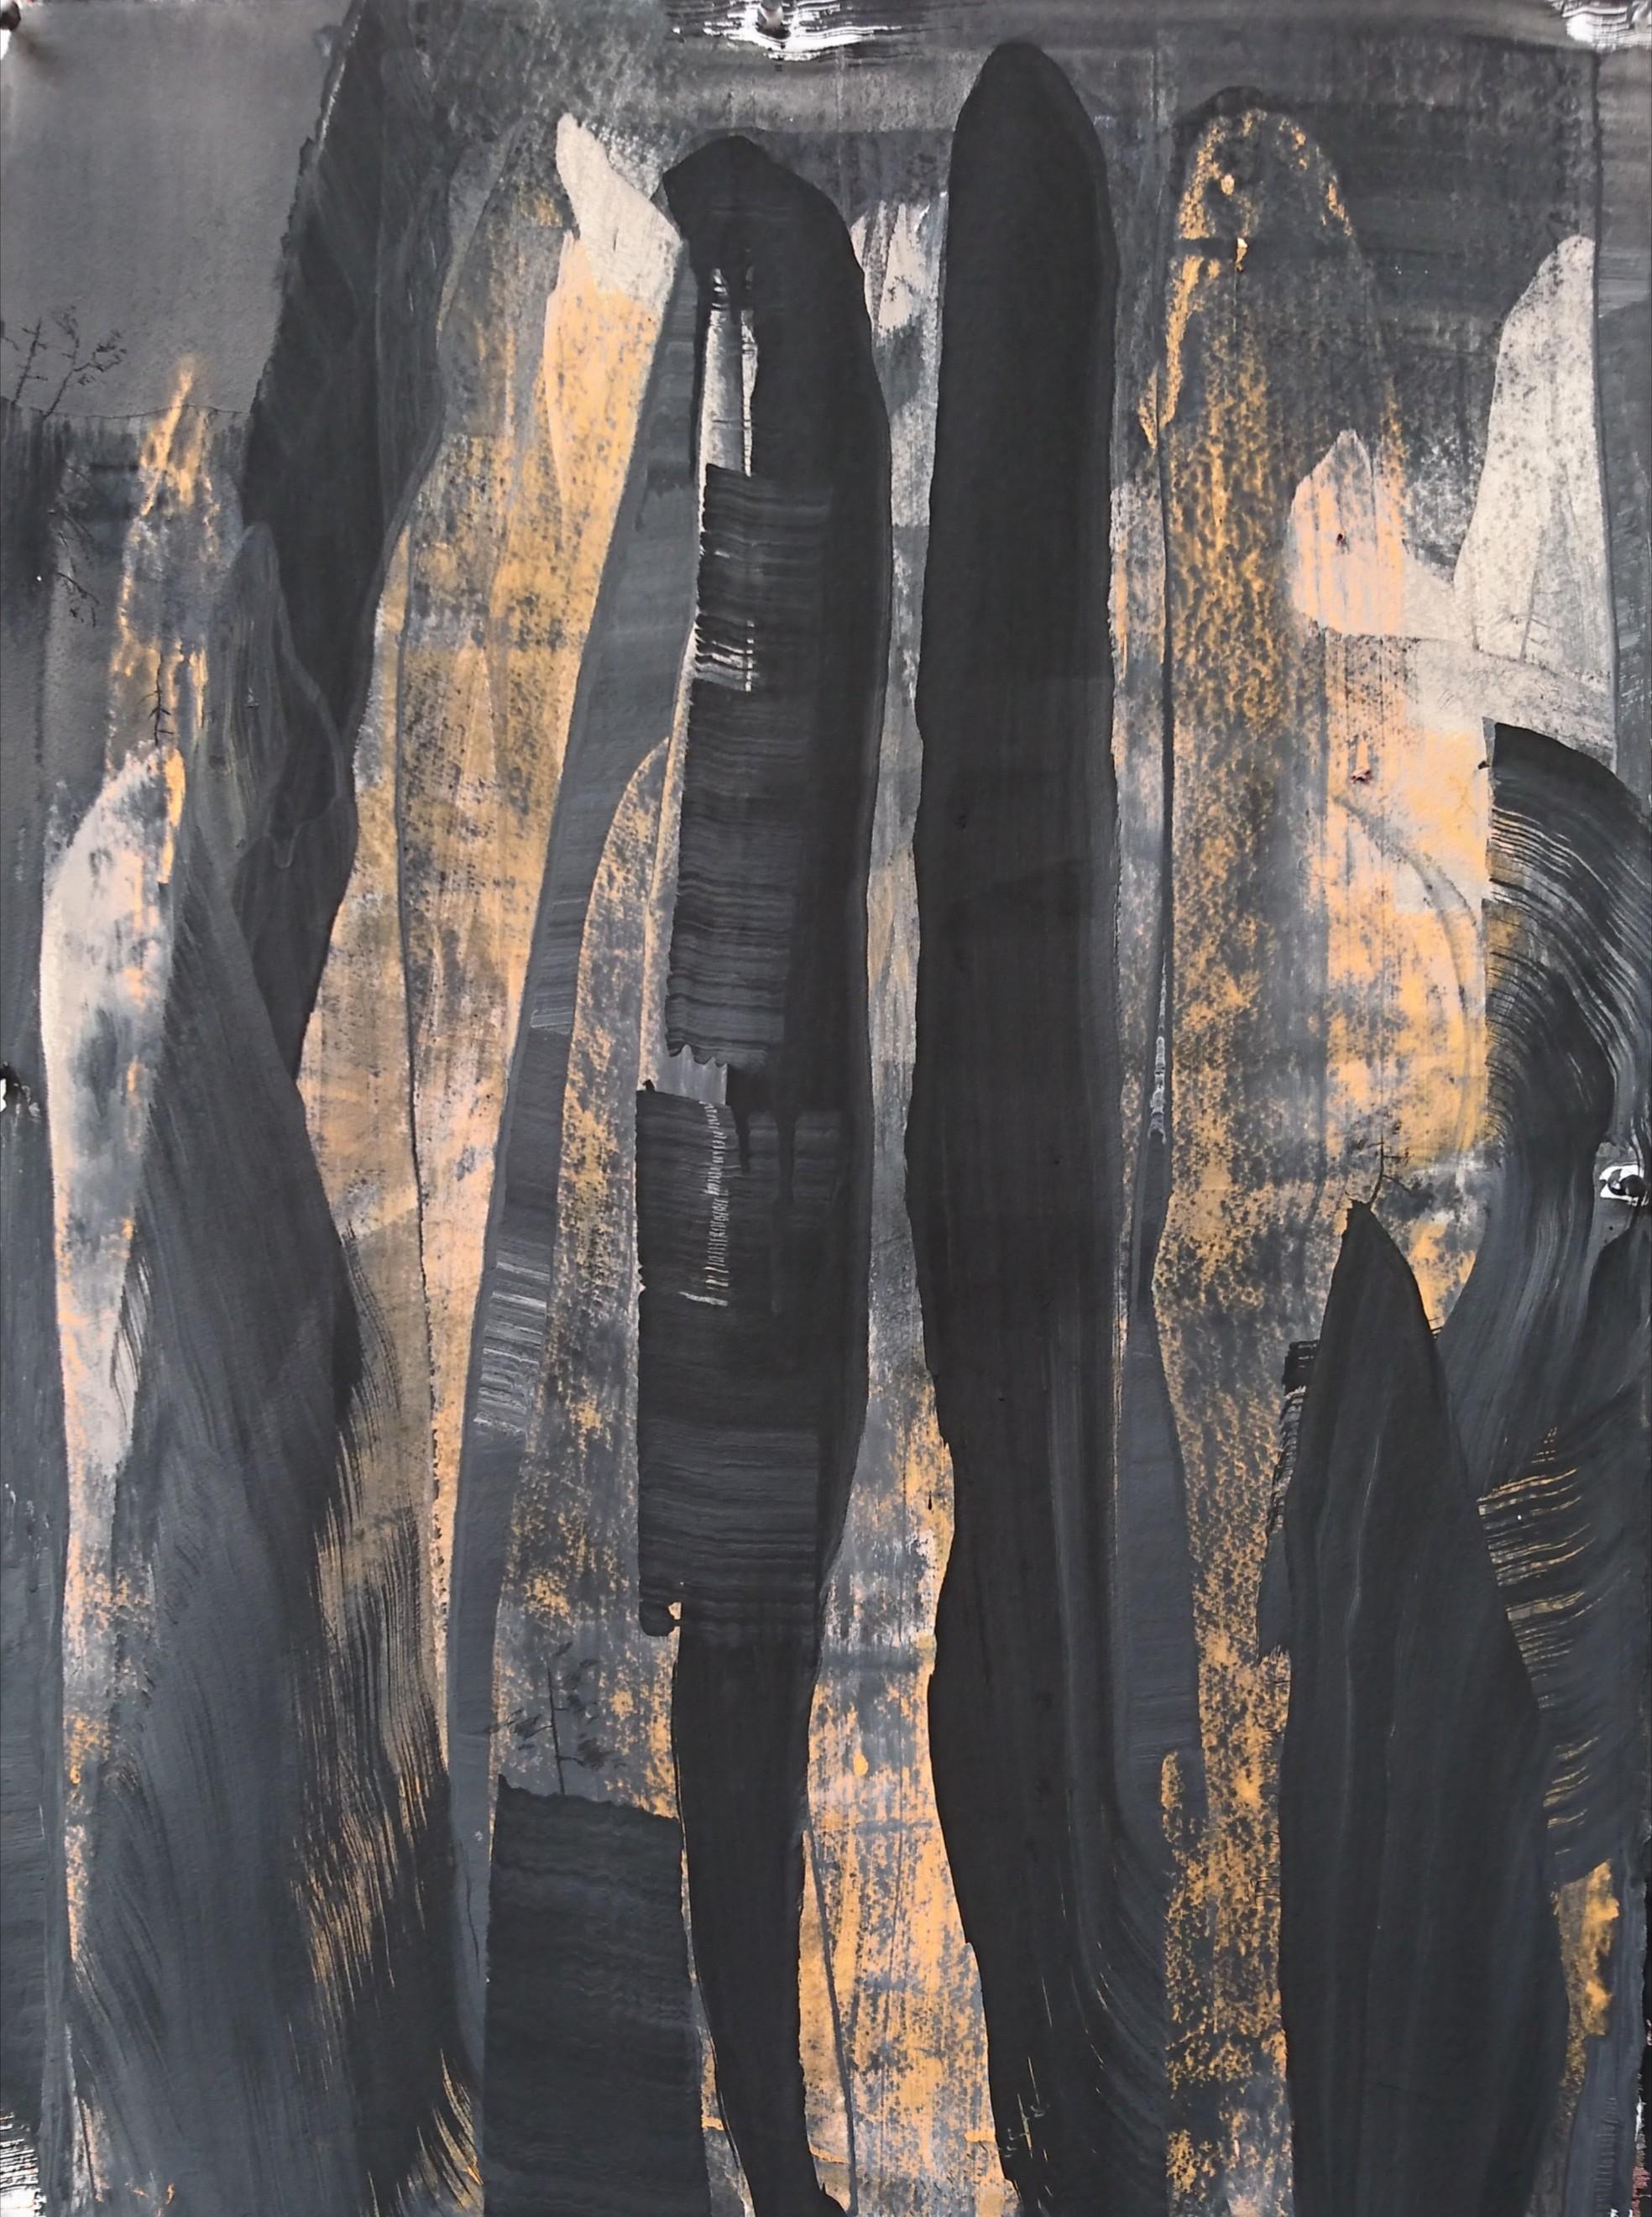 Zahnjiajie Night - No Moon #2, 2018, Acrylic pigment and graphite on 640 gsm, 78 x 58 cm.JPG